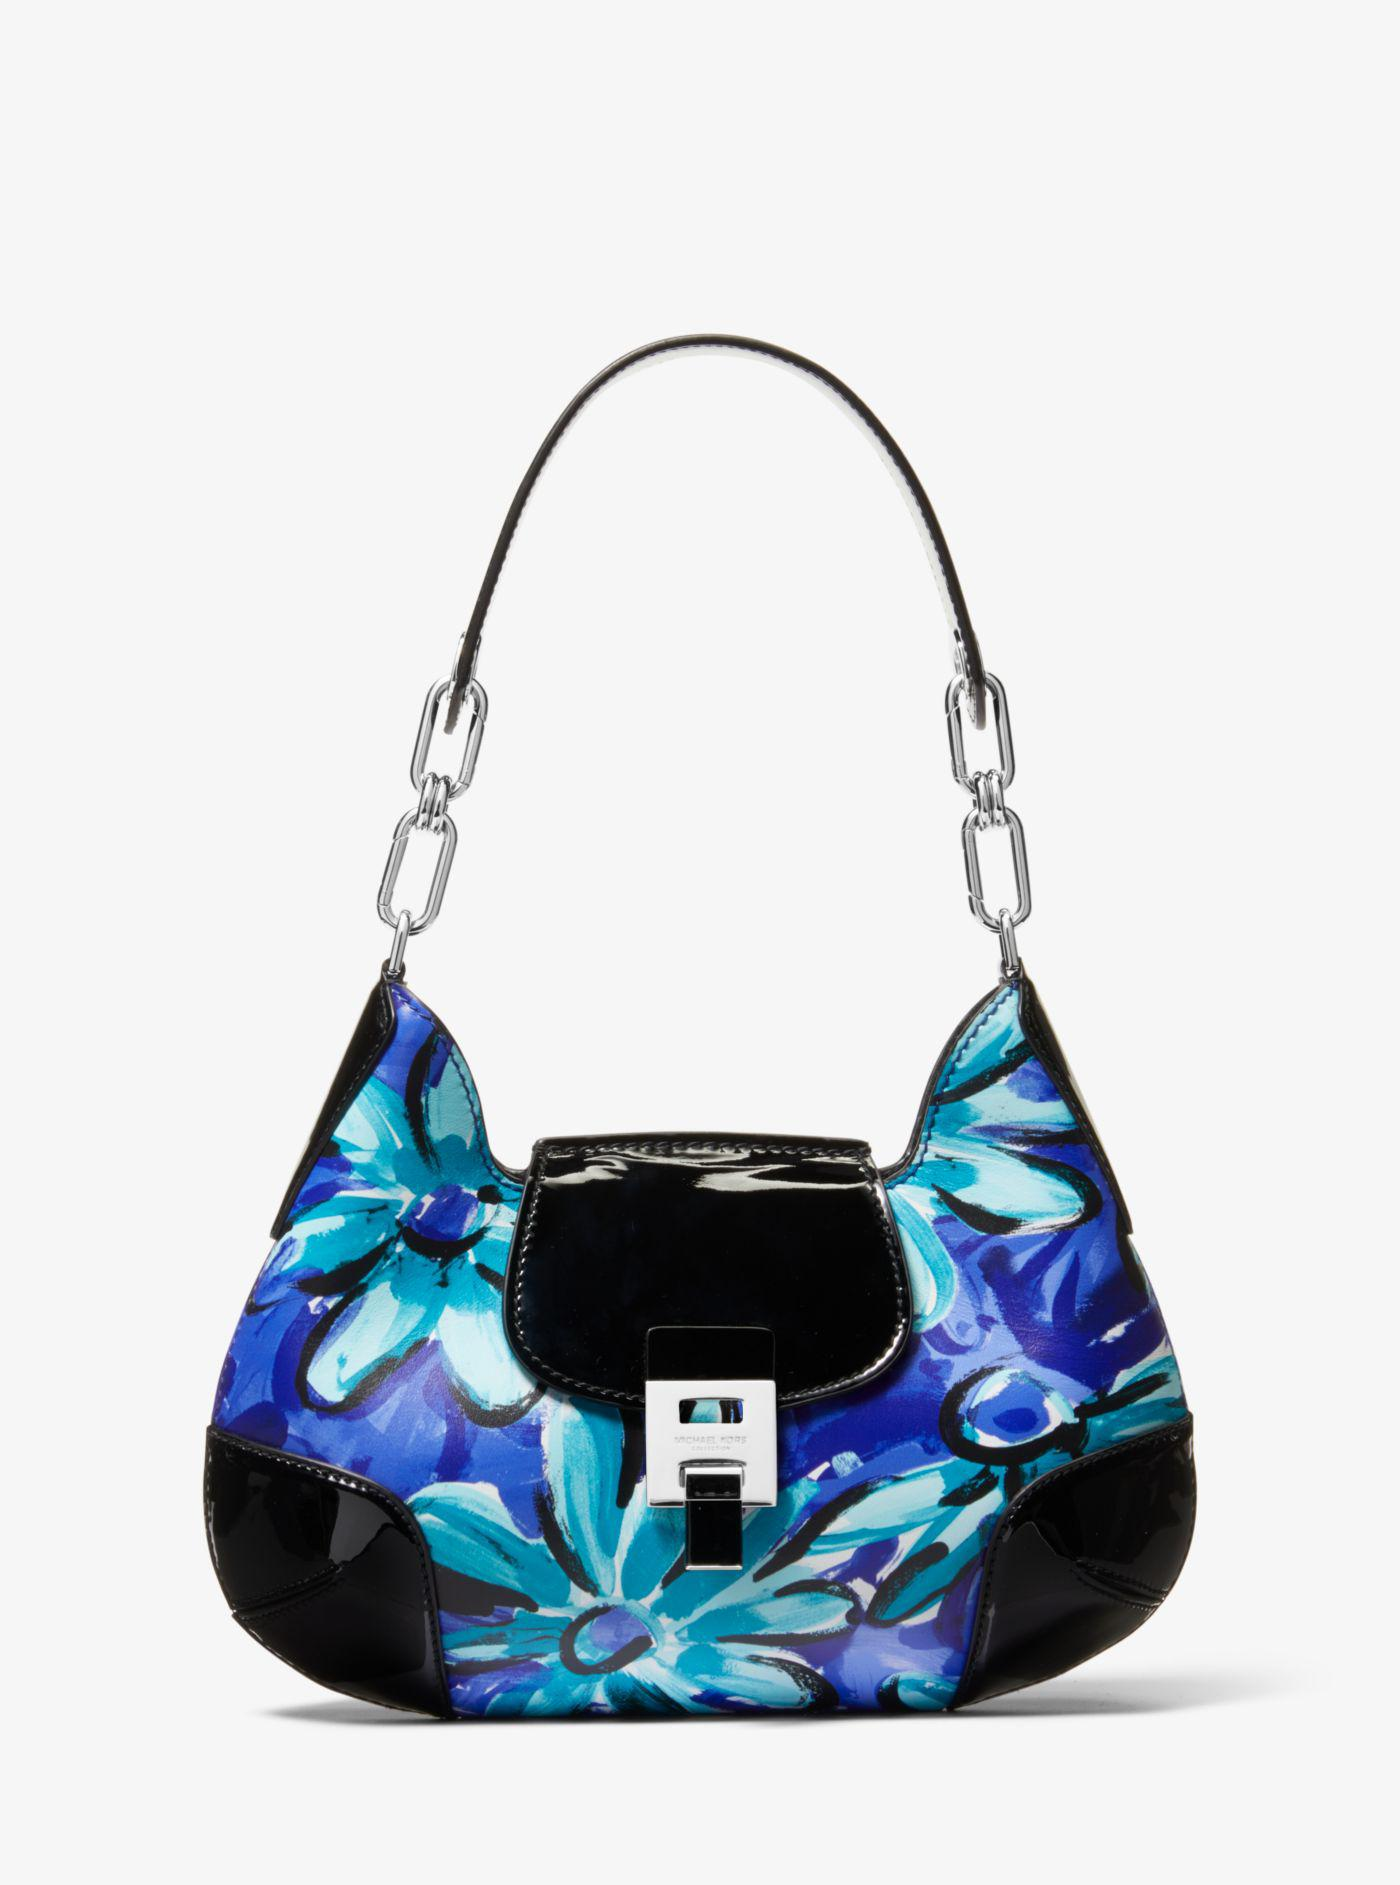 b9463da29bbe Michael Kors. Women's Blue Bancroft Medium Daisy Calf Leather Shoulder Bag